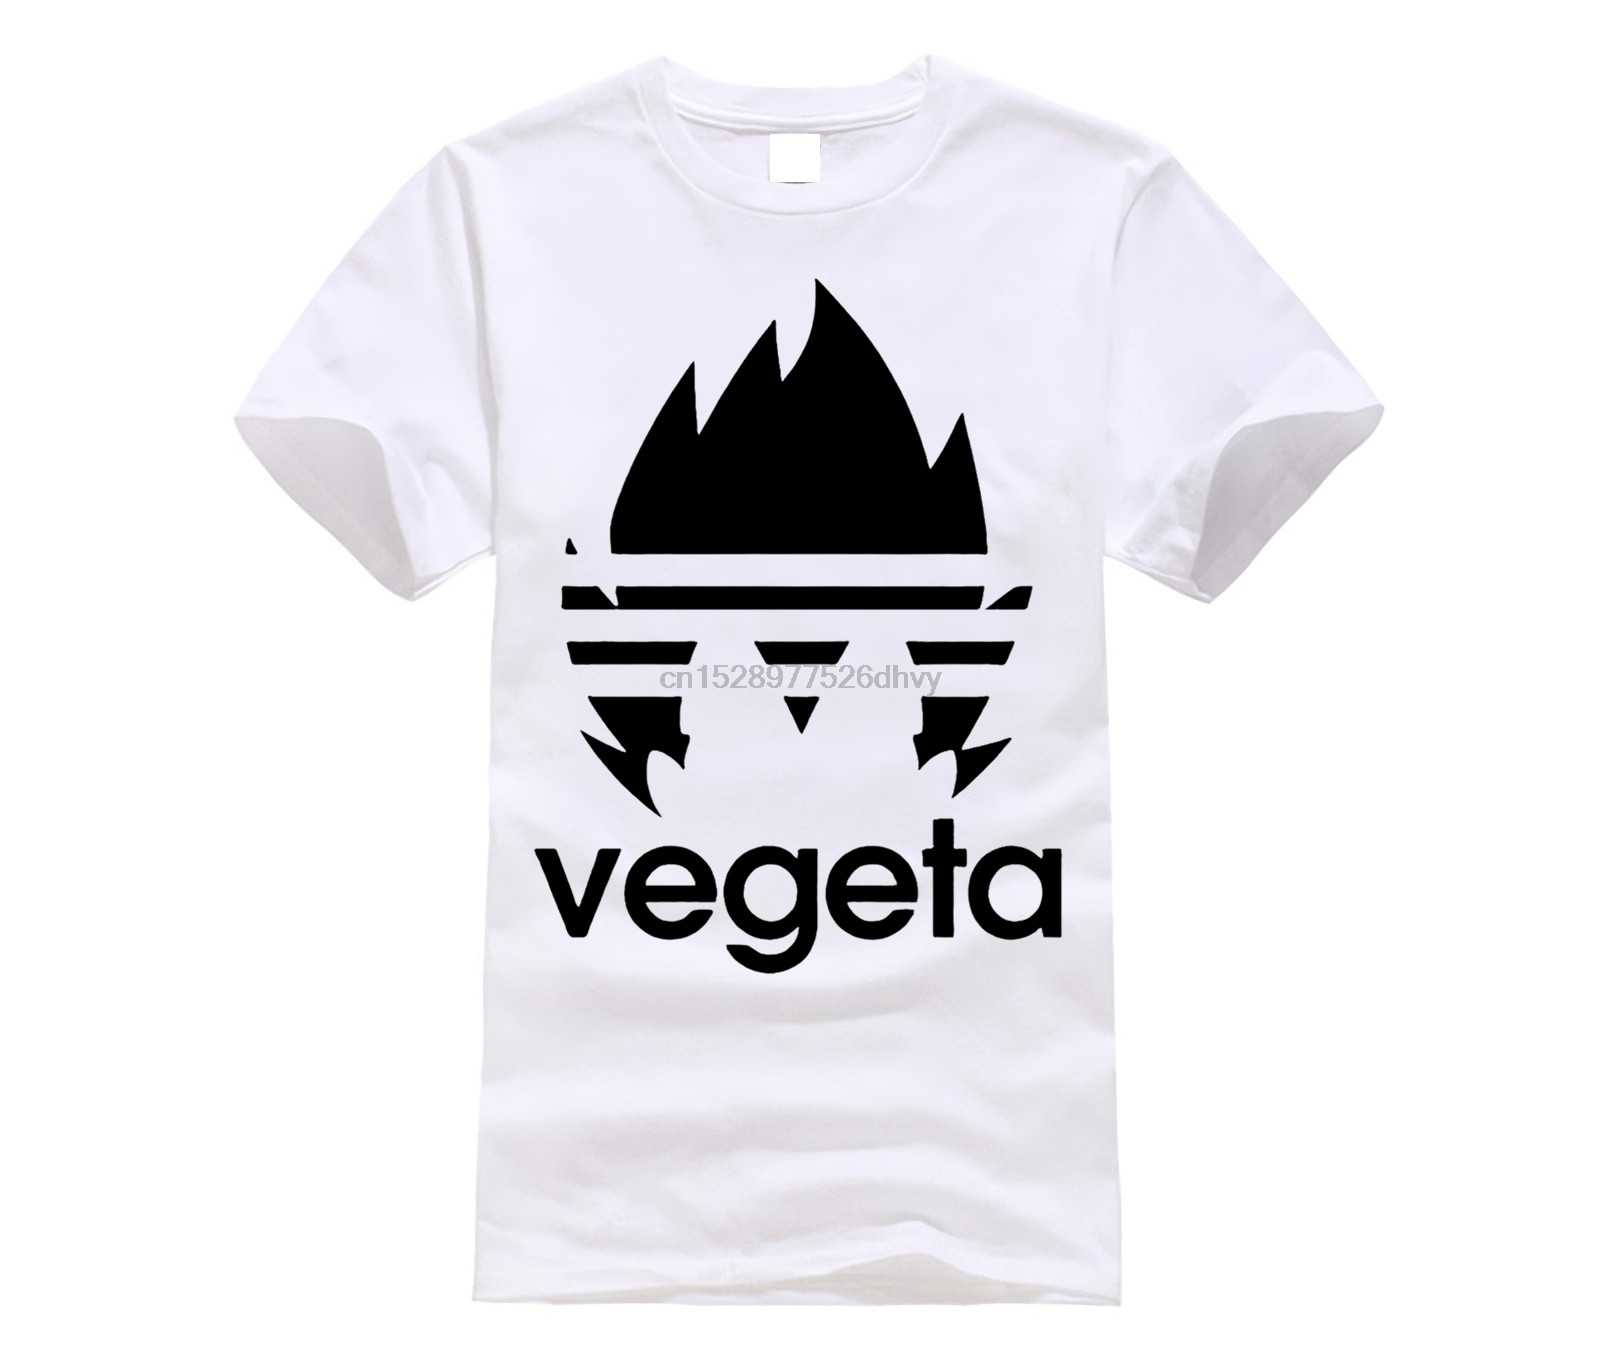 Мужская футболка Addidas Vegeta, бренд 2019